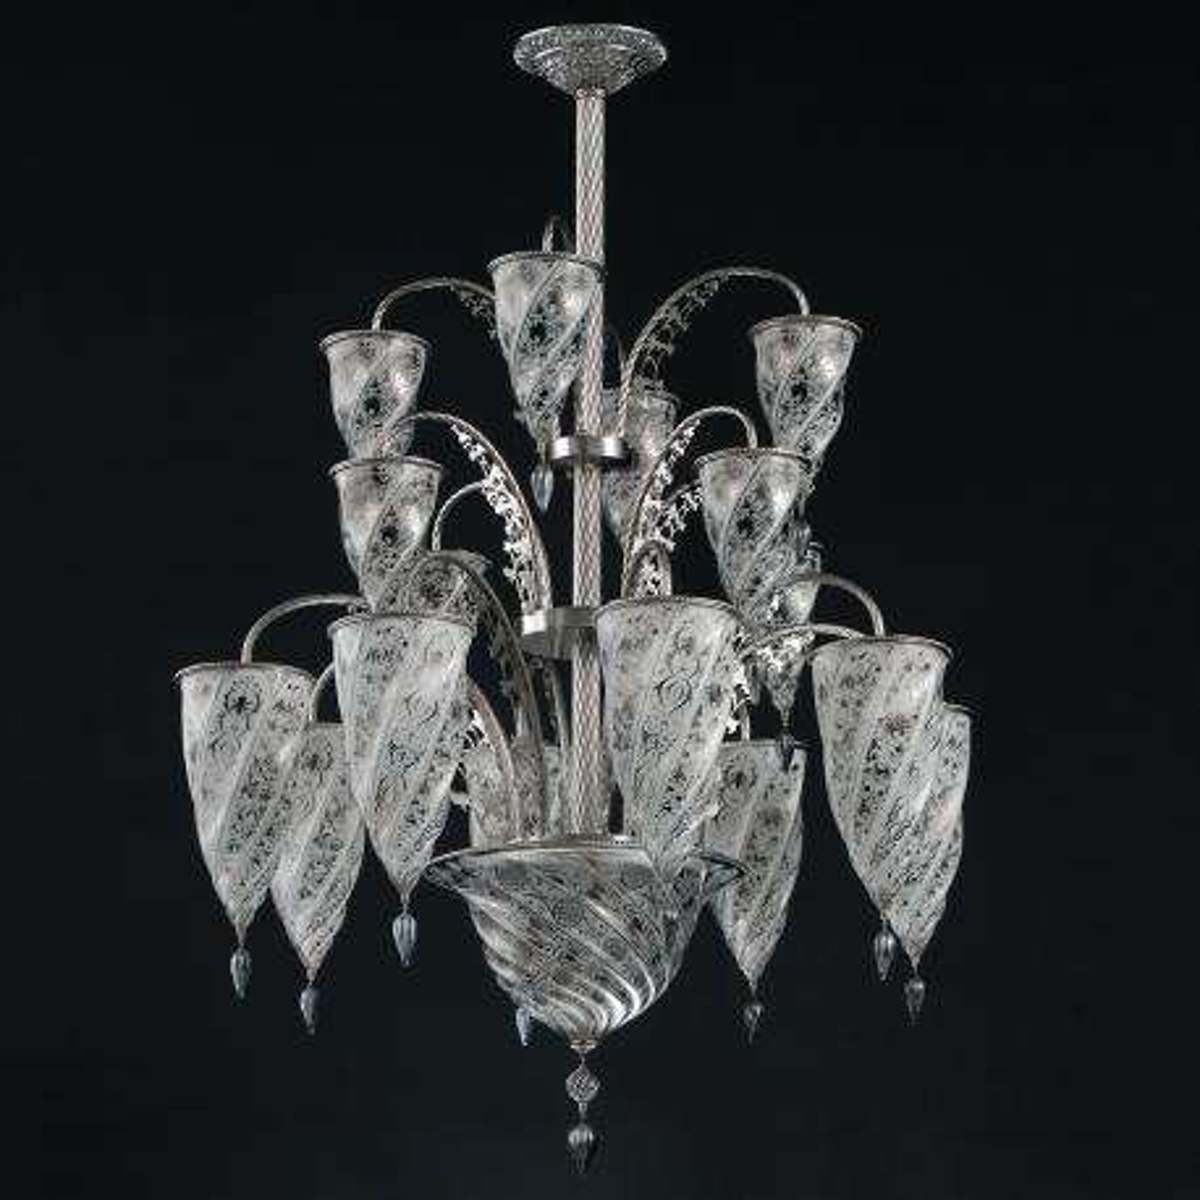 """Luxor"" Murano glass chandelier - 17 lights - white"